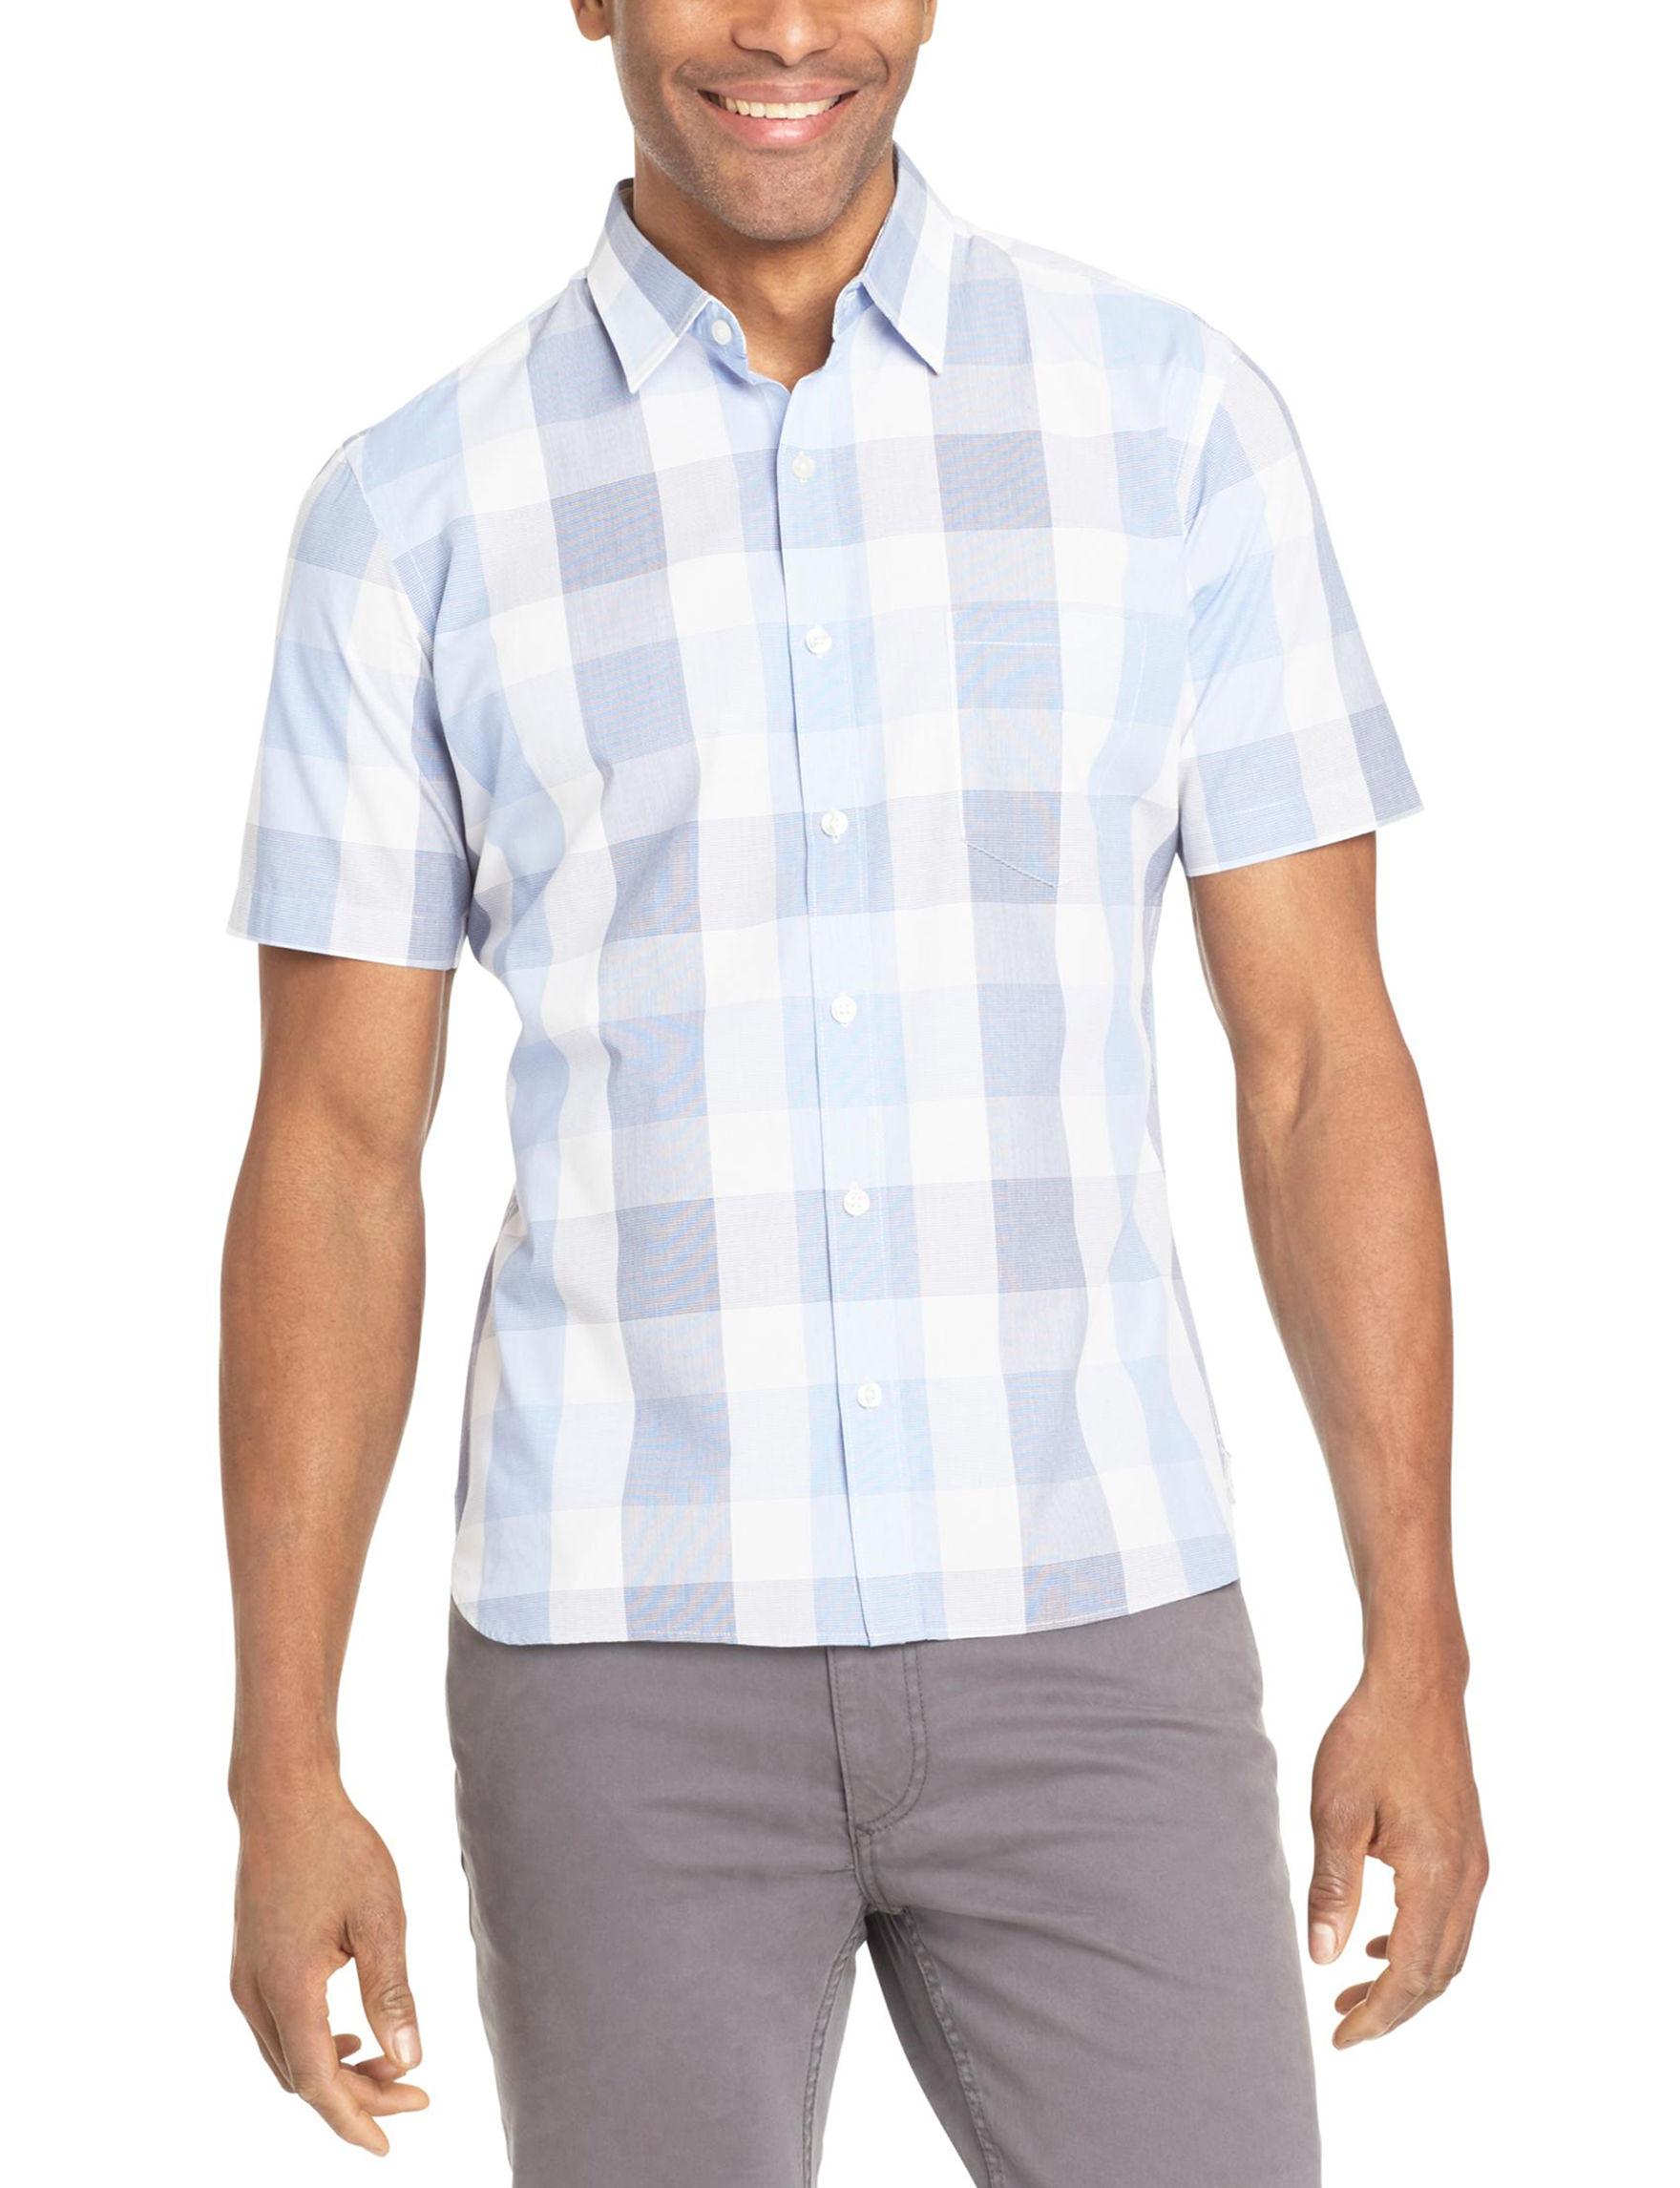 Van Heusen Blue Plaid Casual Button Down Shirts